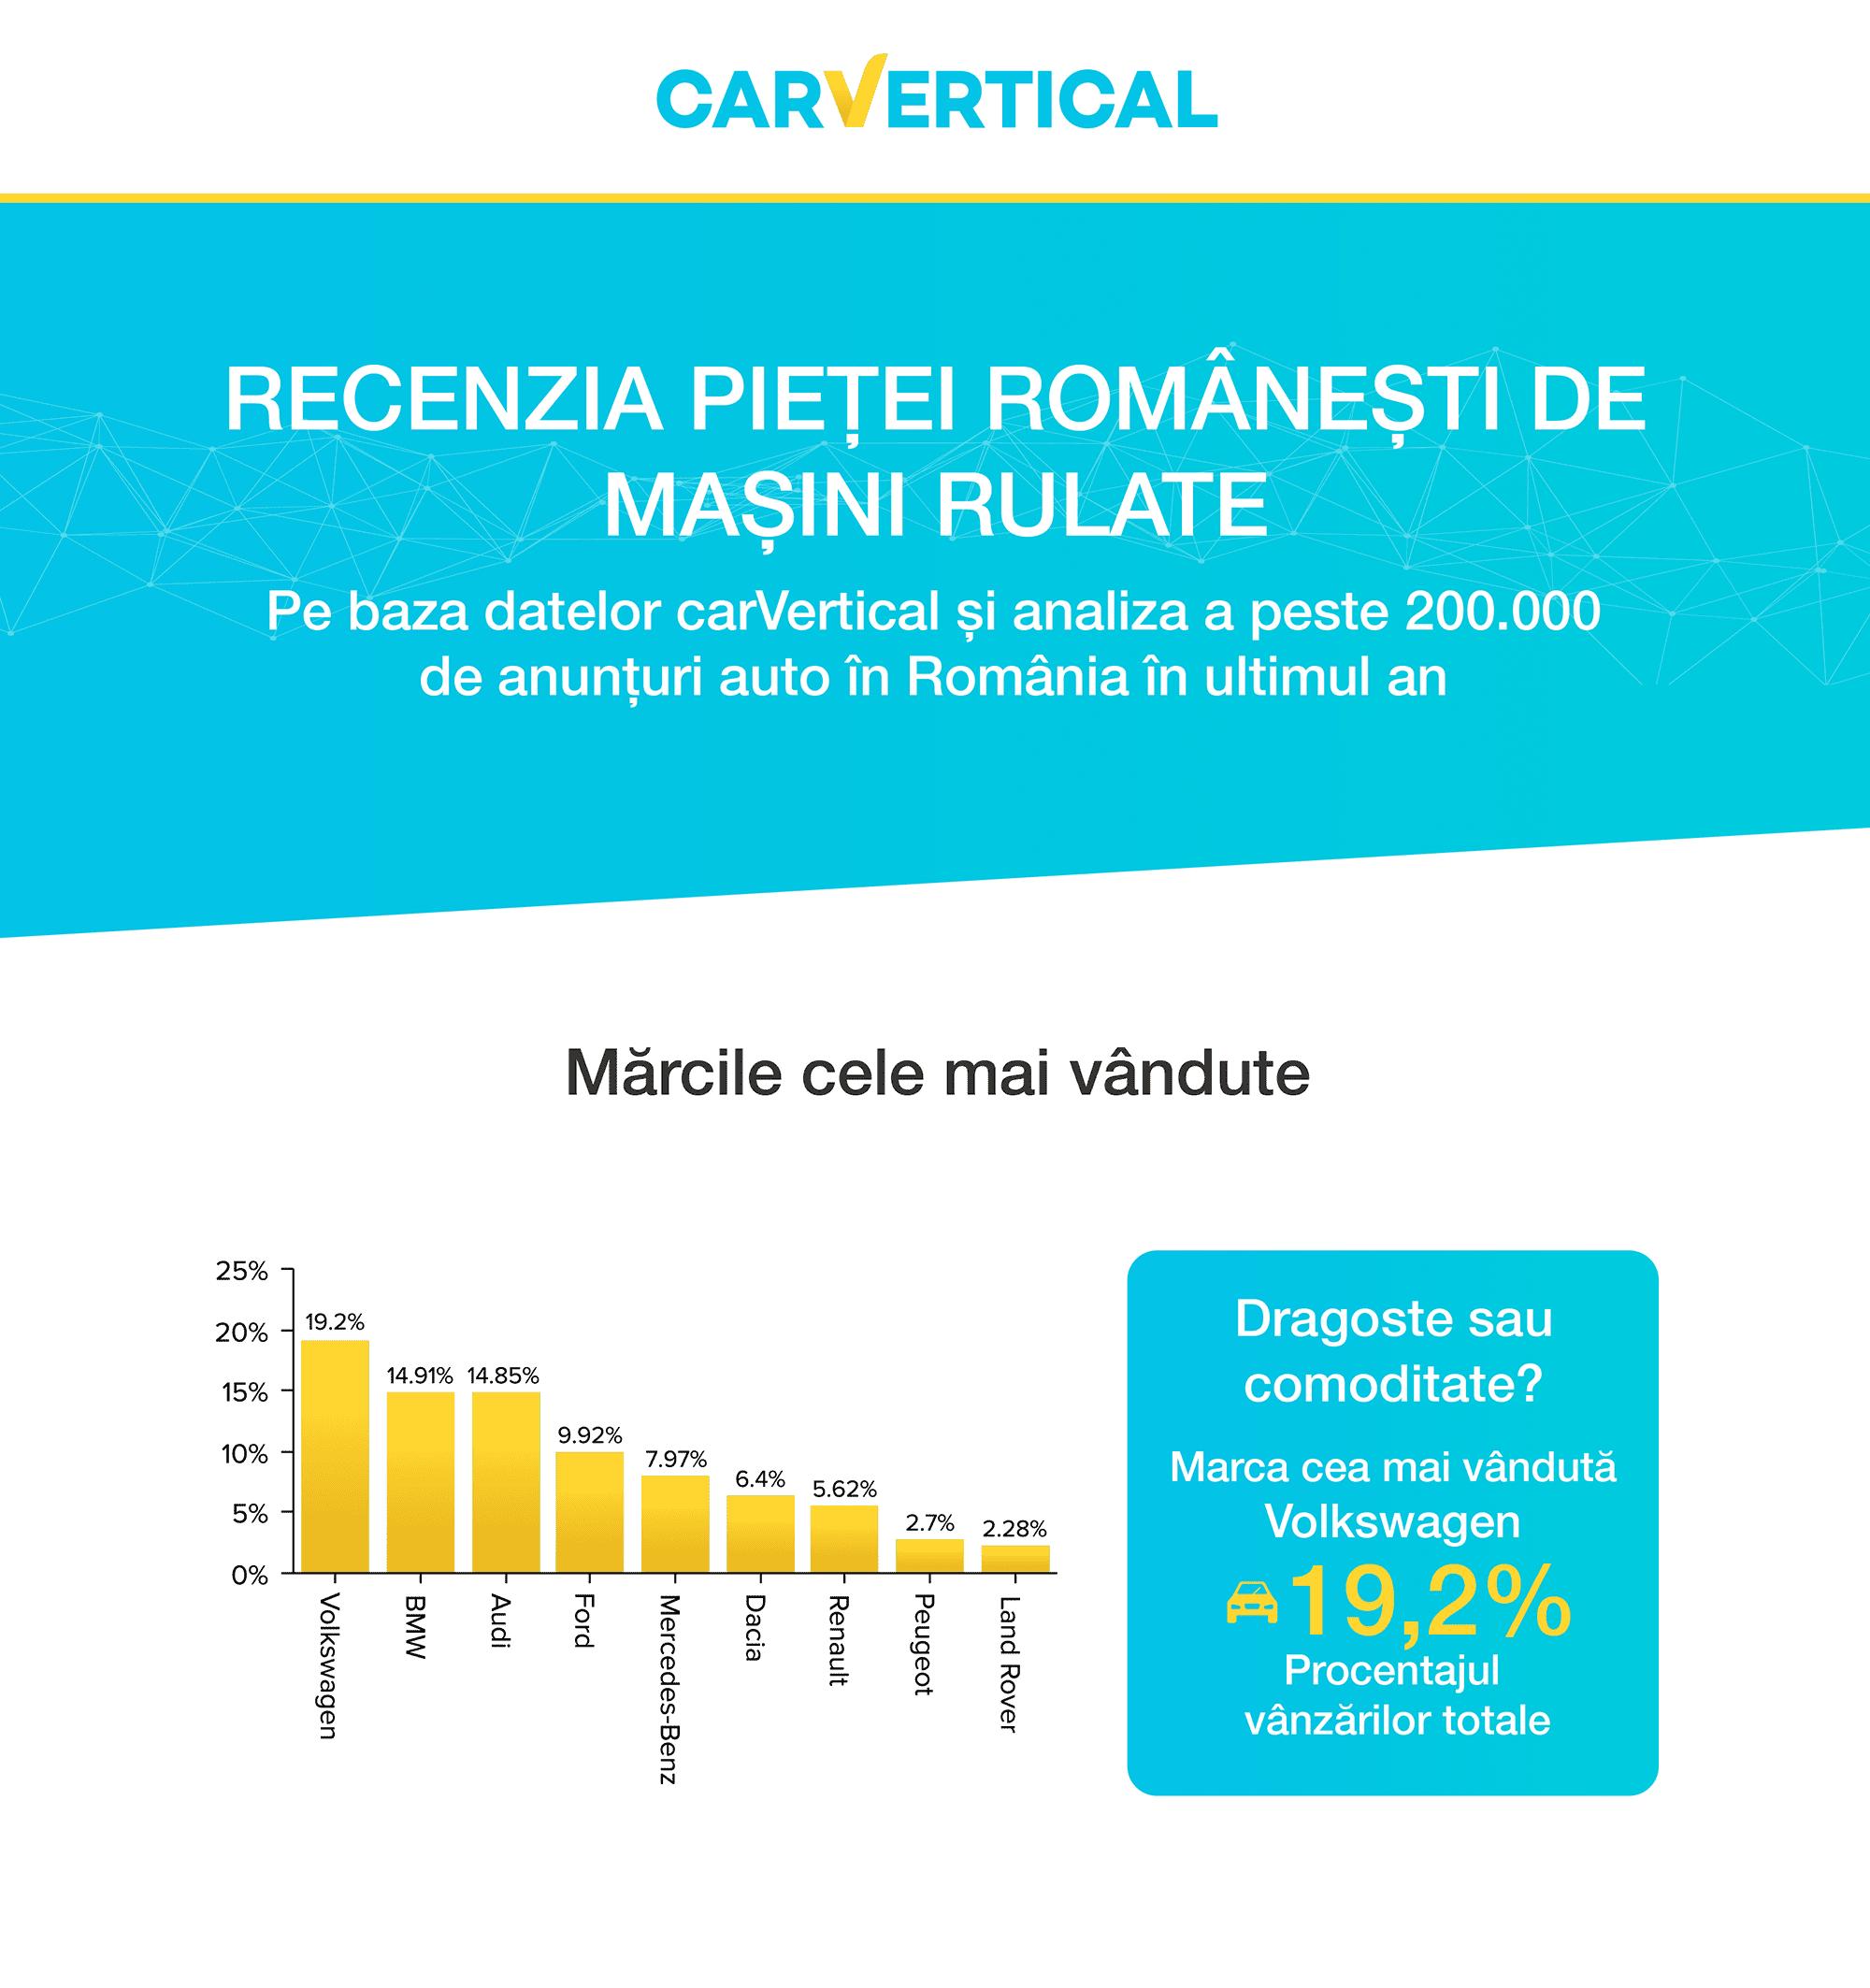 carvertical_verificare-vin_concluzii-romania